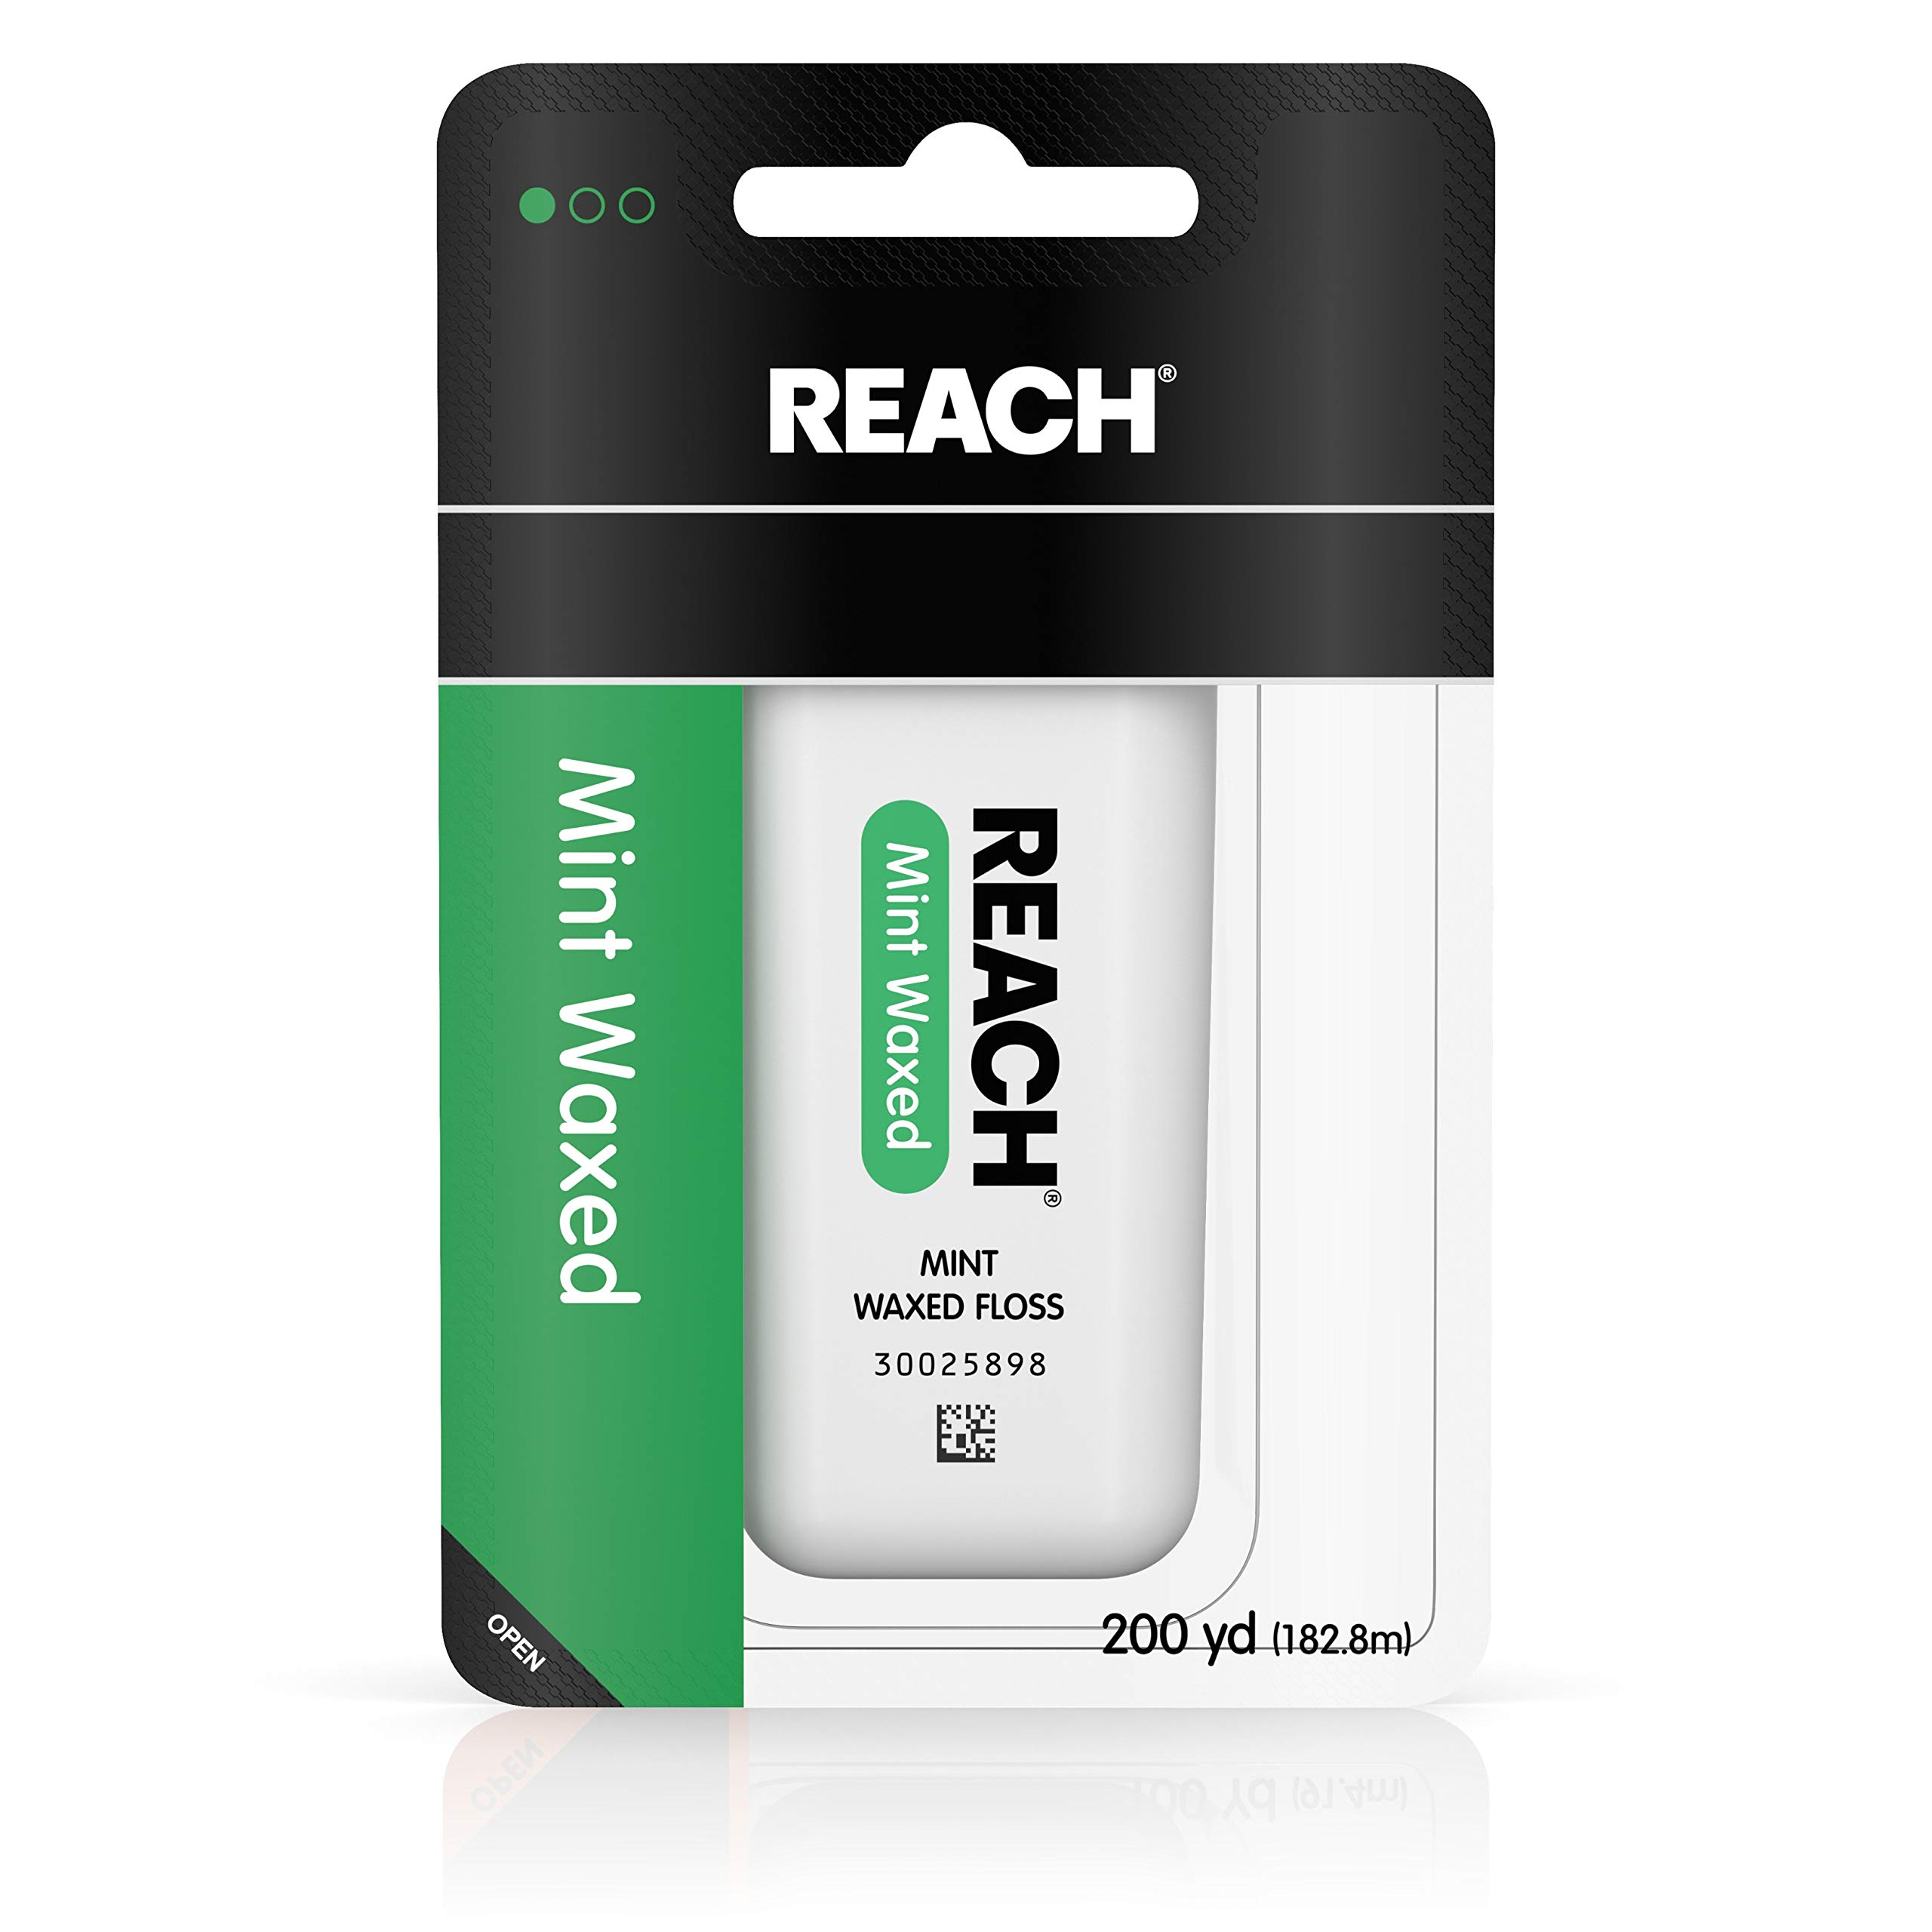 Reach Mint Waxed Floss Pack